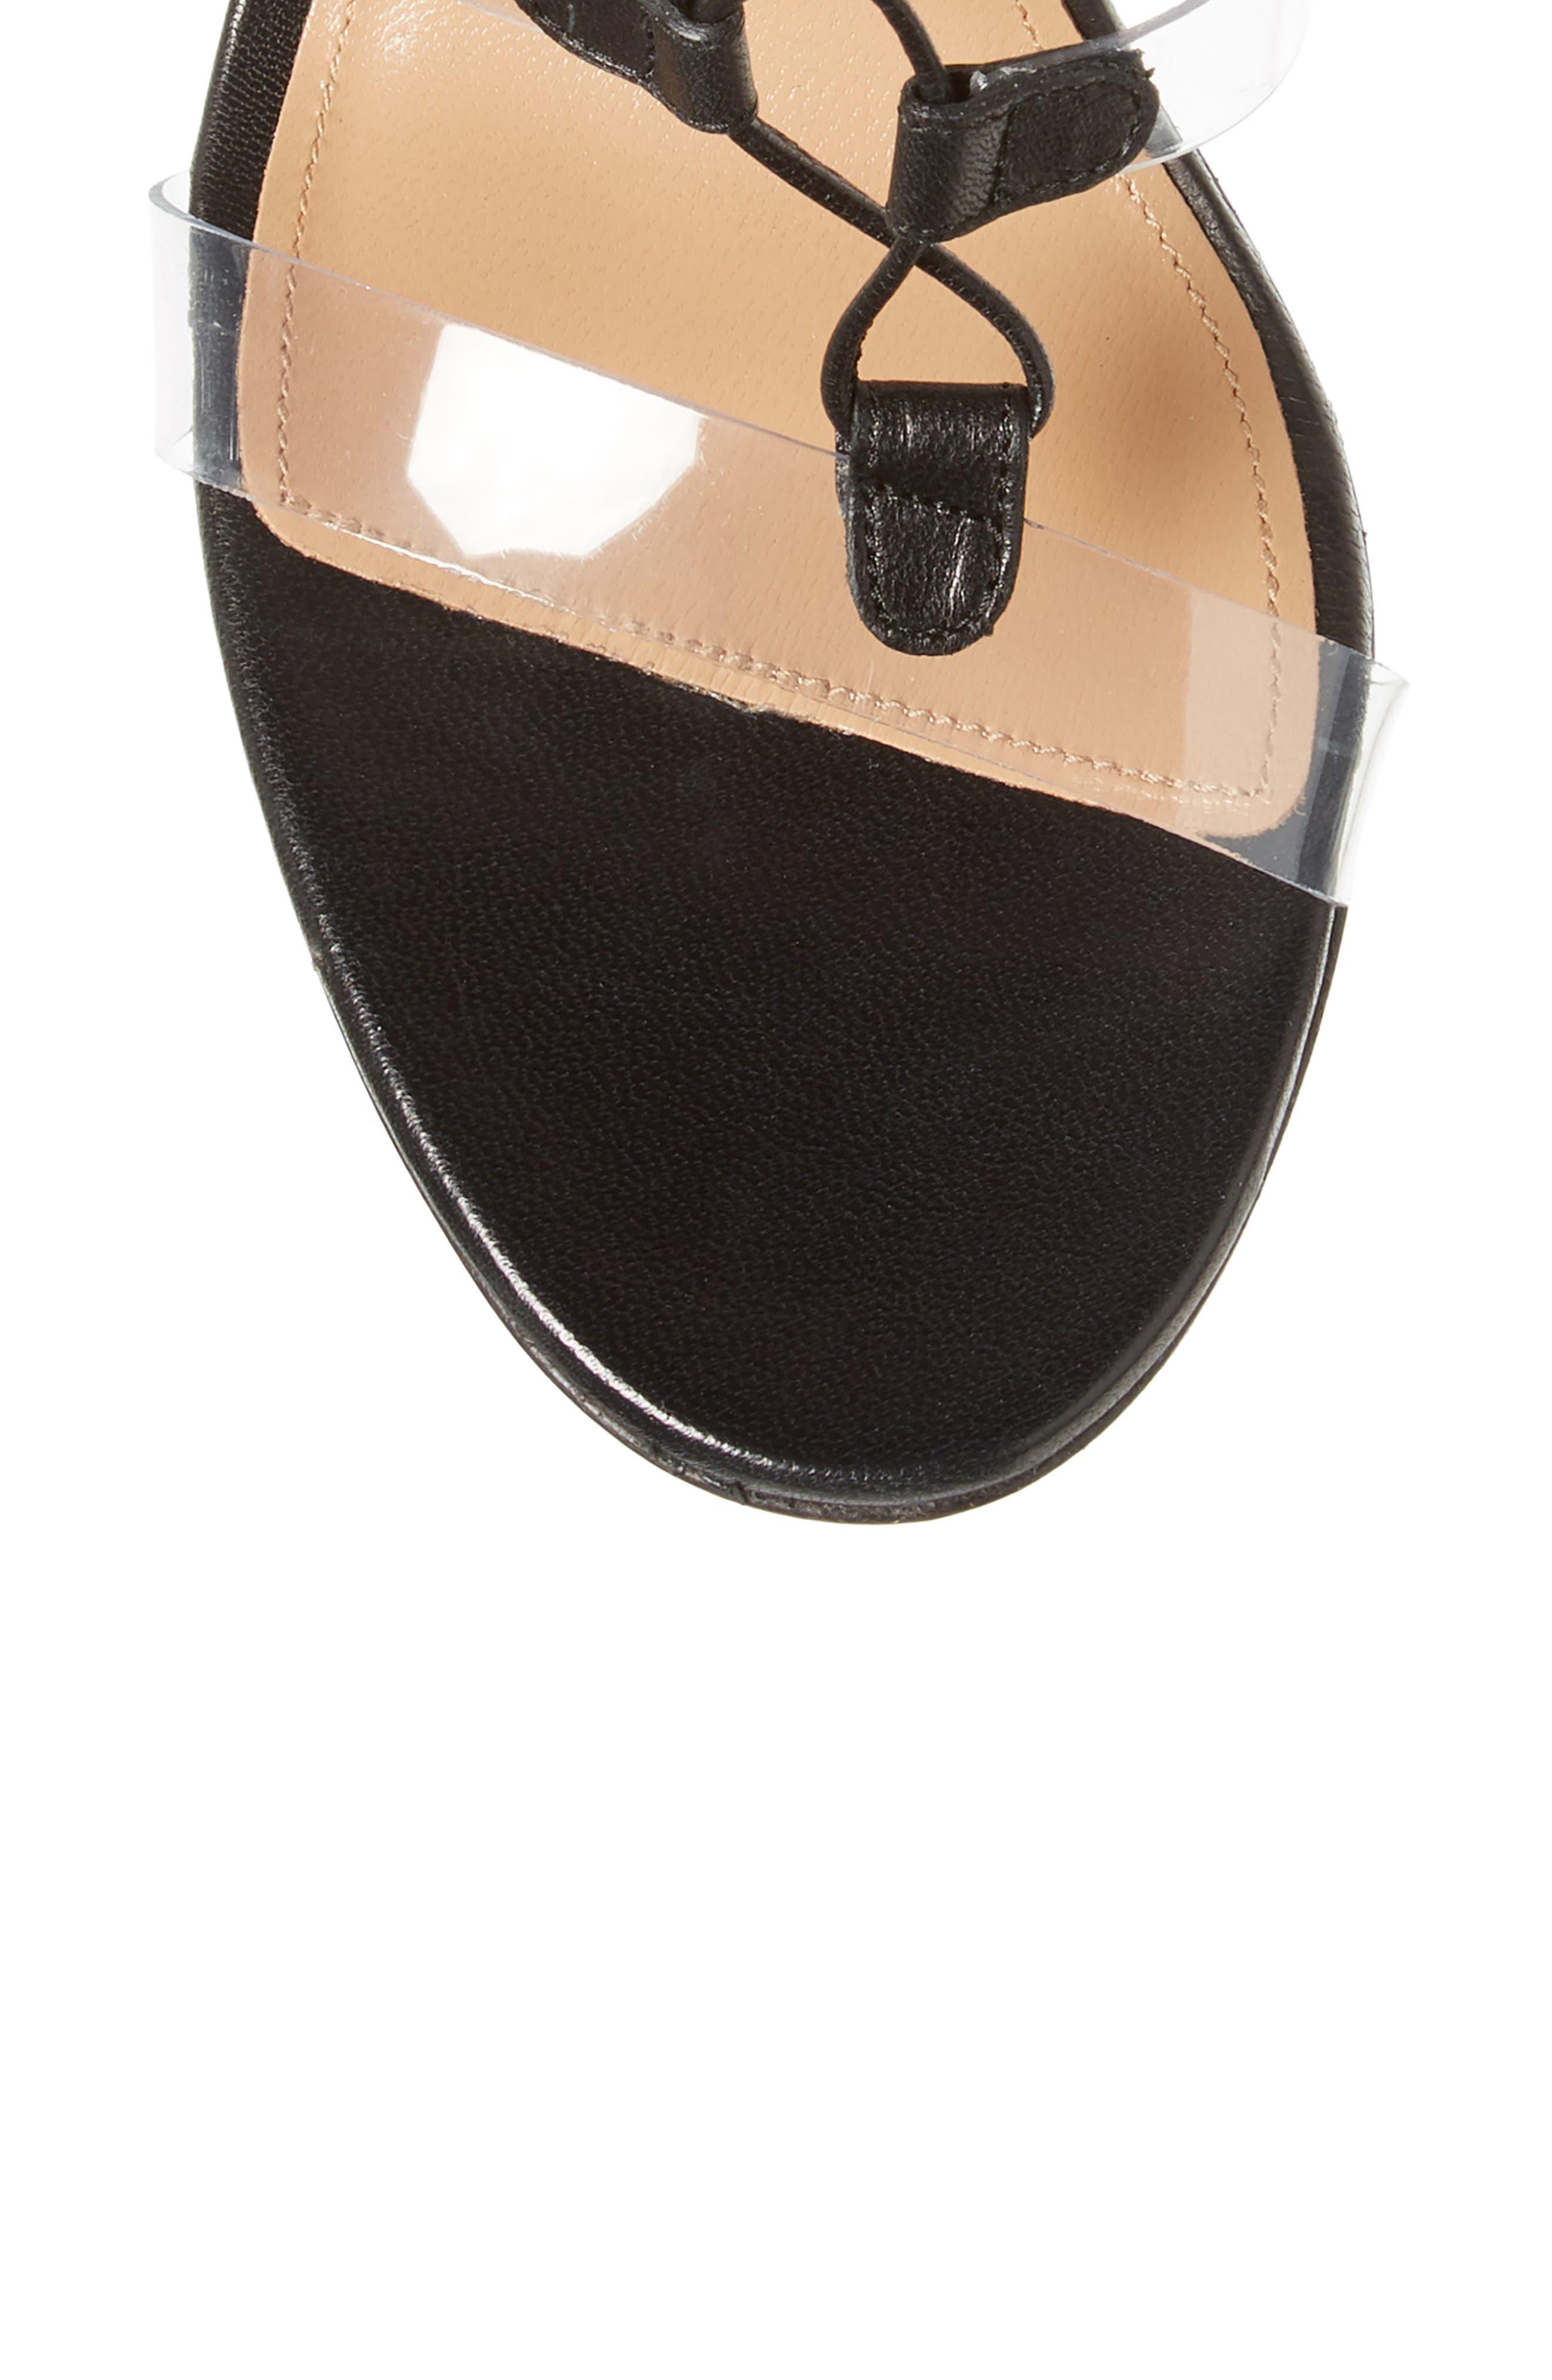 AQUAZZURA, Milos PVC Lace-Up Sandal, Alternate thumbnail 5, color, BLACK